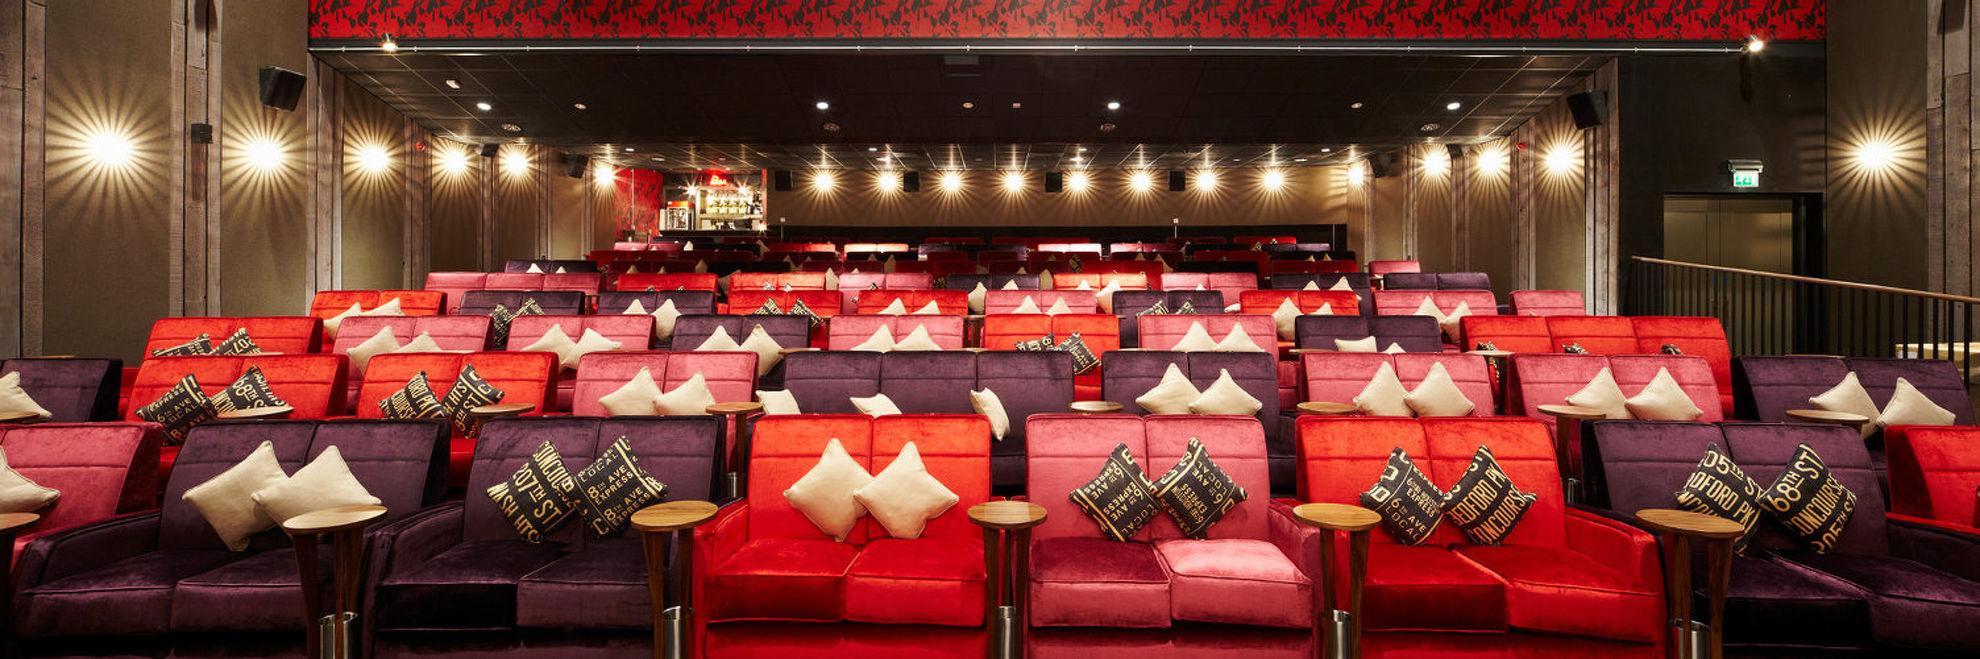 Explore Everyman Cinema Leeds